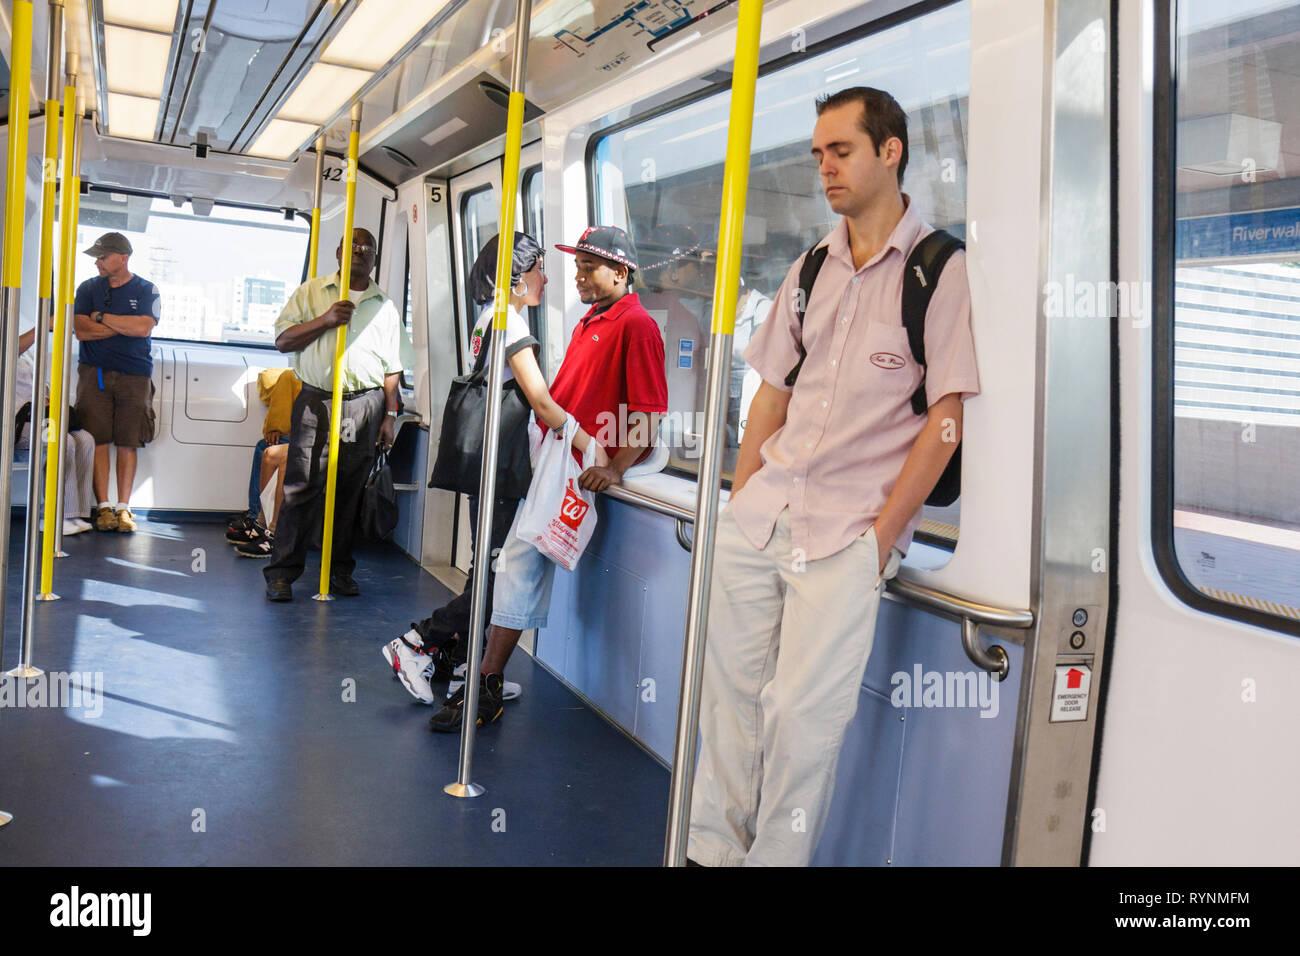 Miami Florida Metromover mass transit public transportation automated people mover Bombardier CX-100 Black woman man men biracia - Stock Image